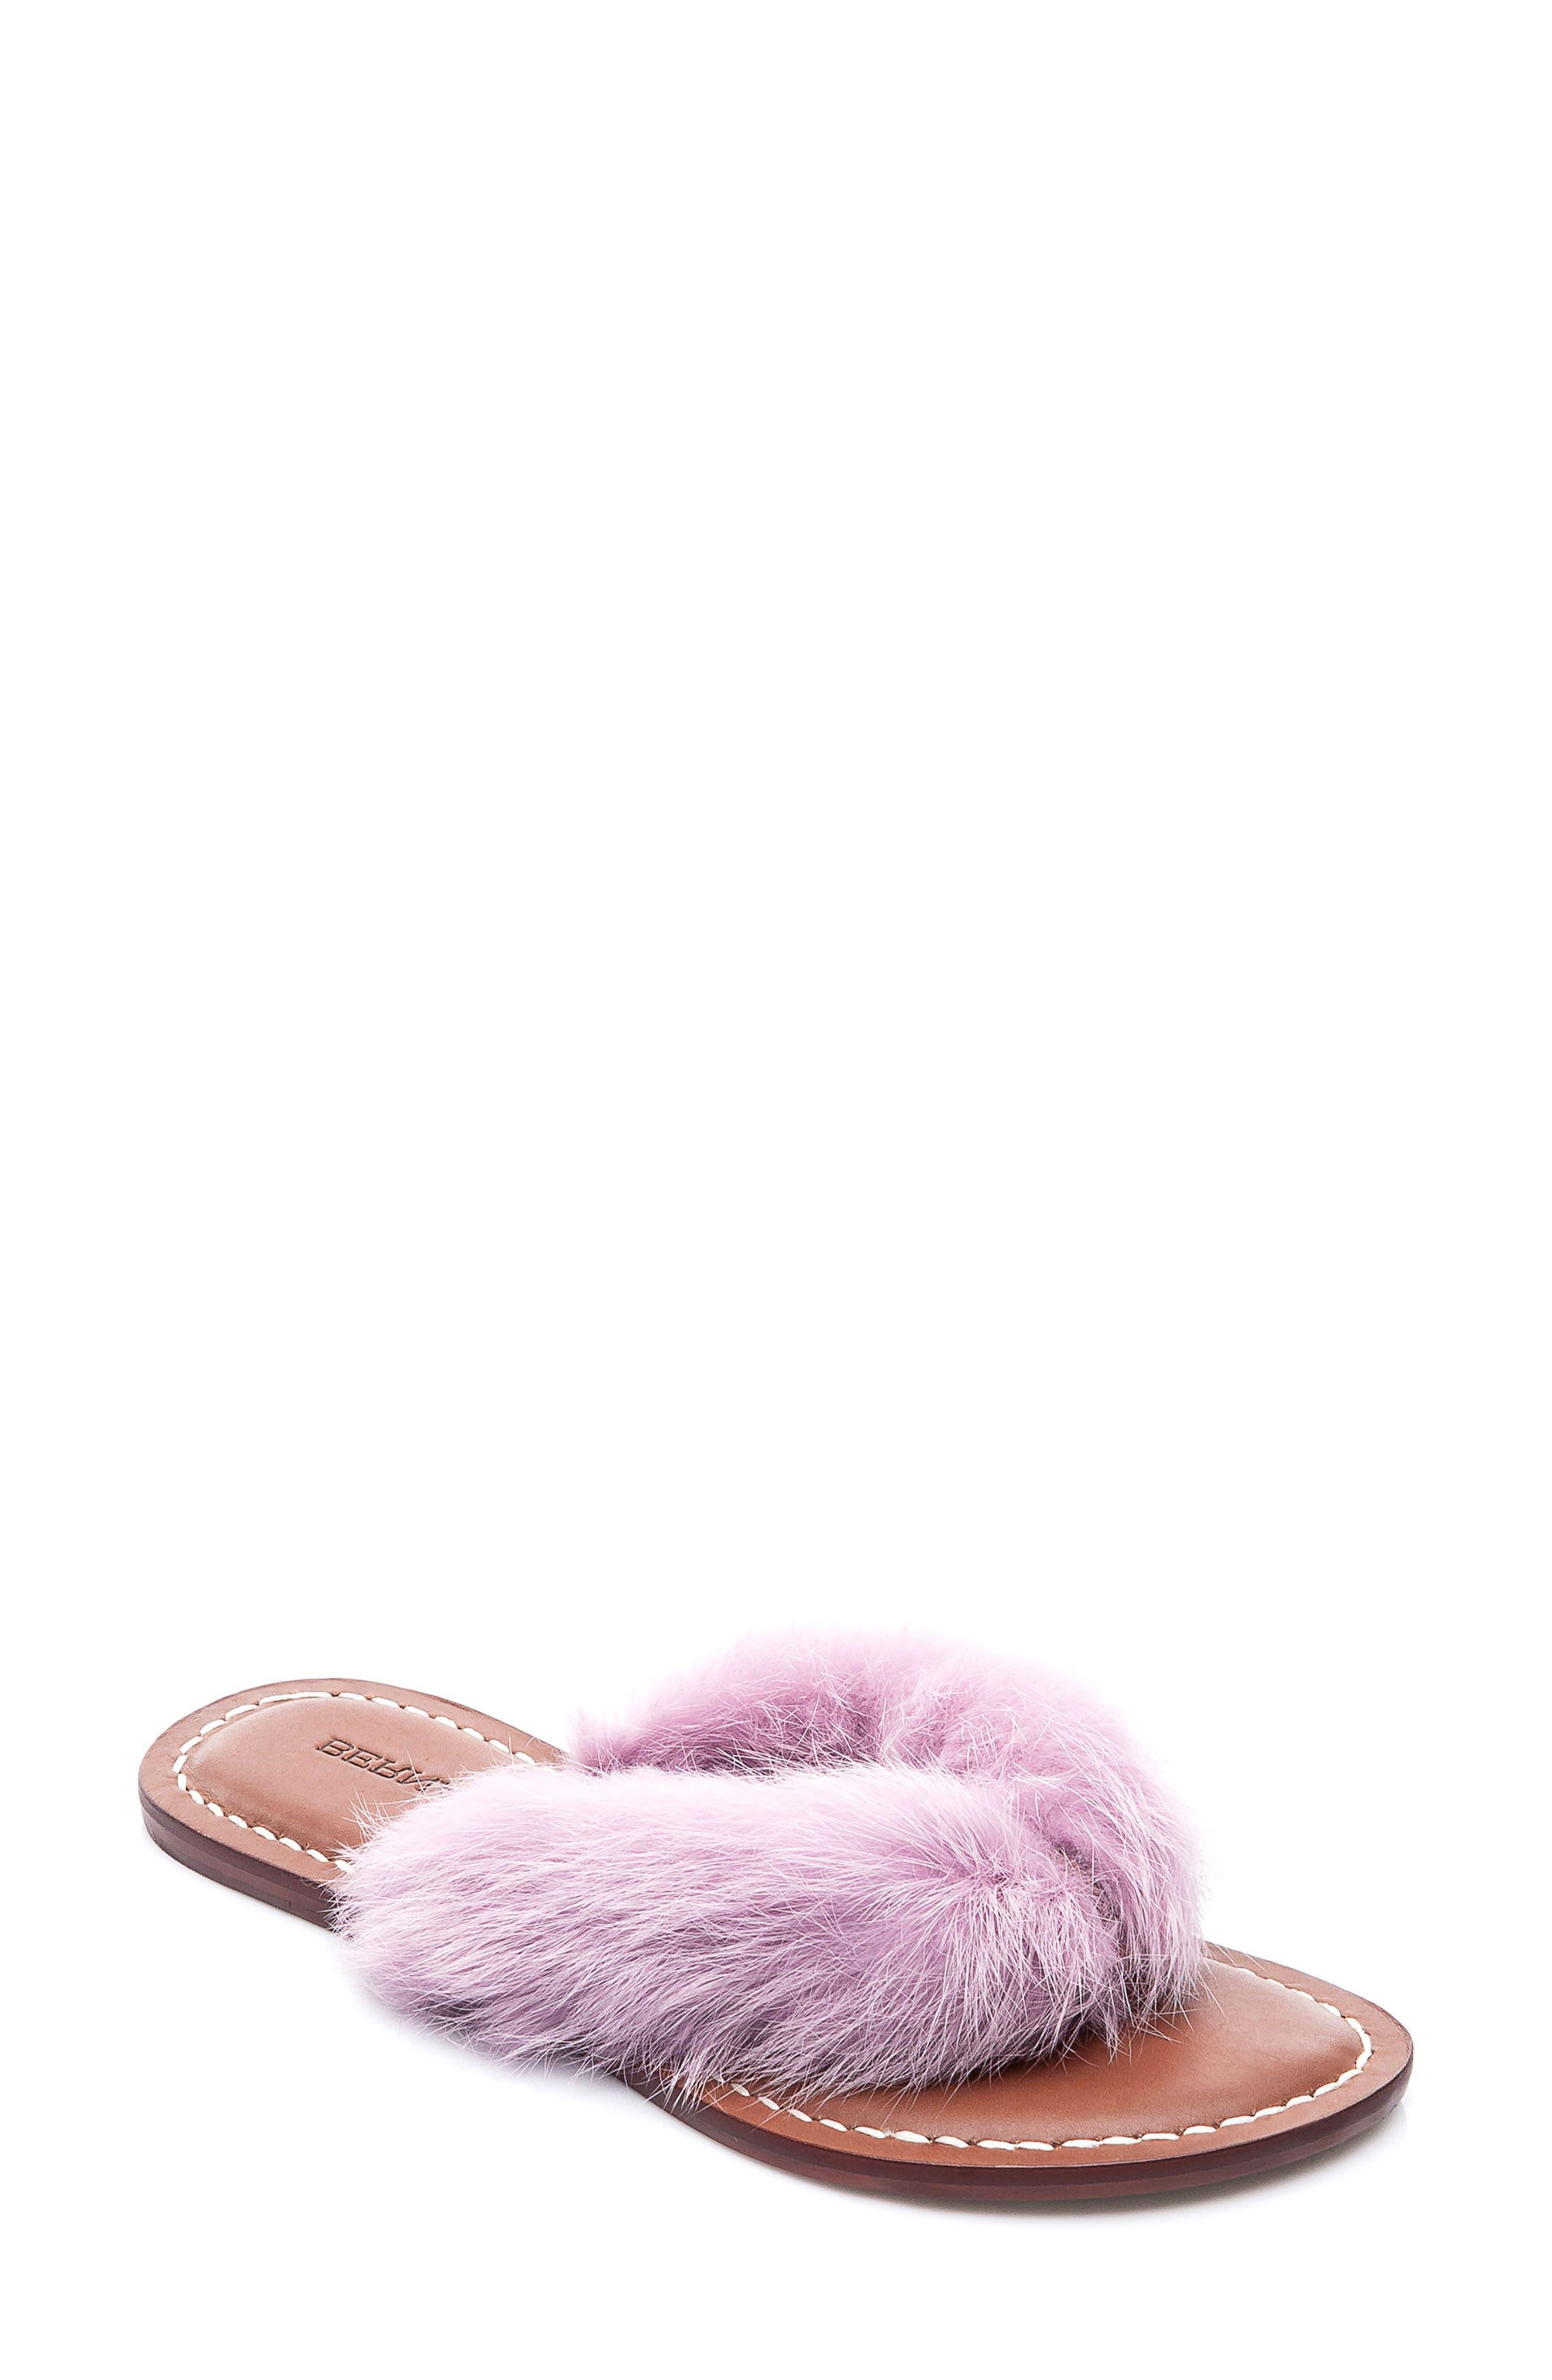 Alternate Image 1 Selected - Bernardo Genuine Rabbit Fur Flip Flop (Women)